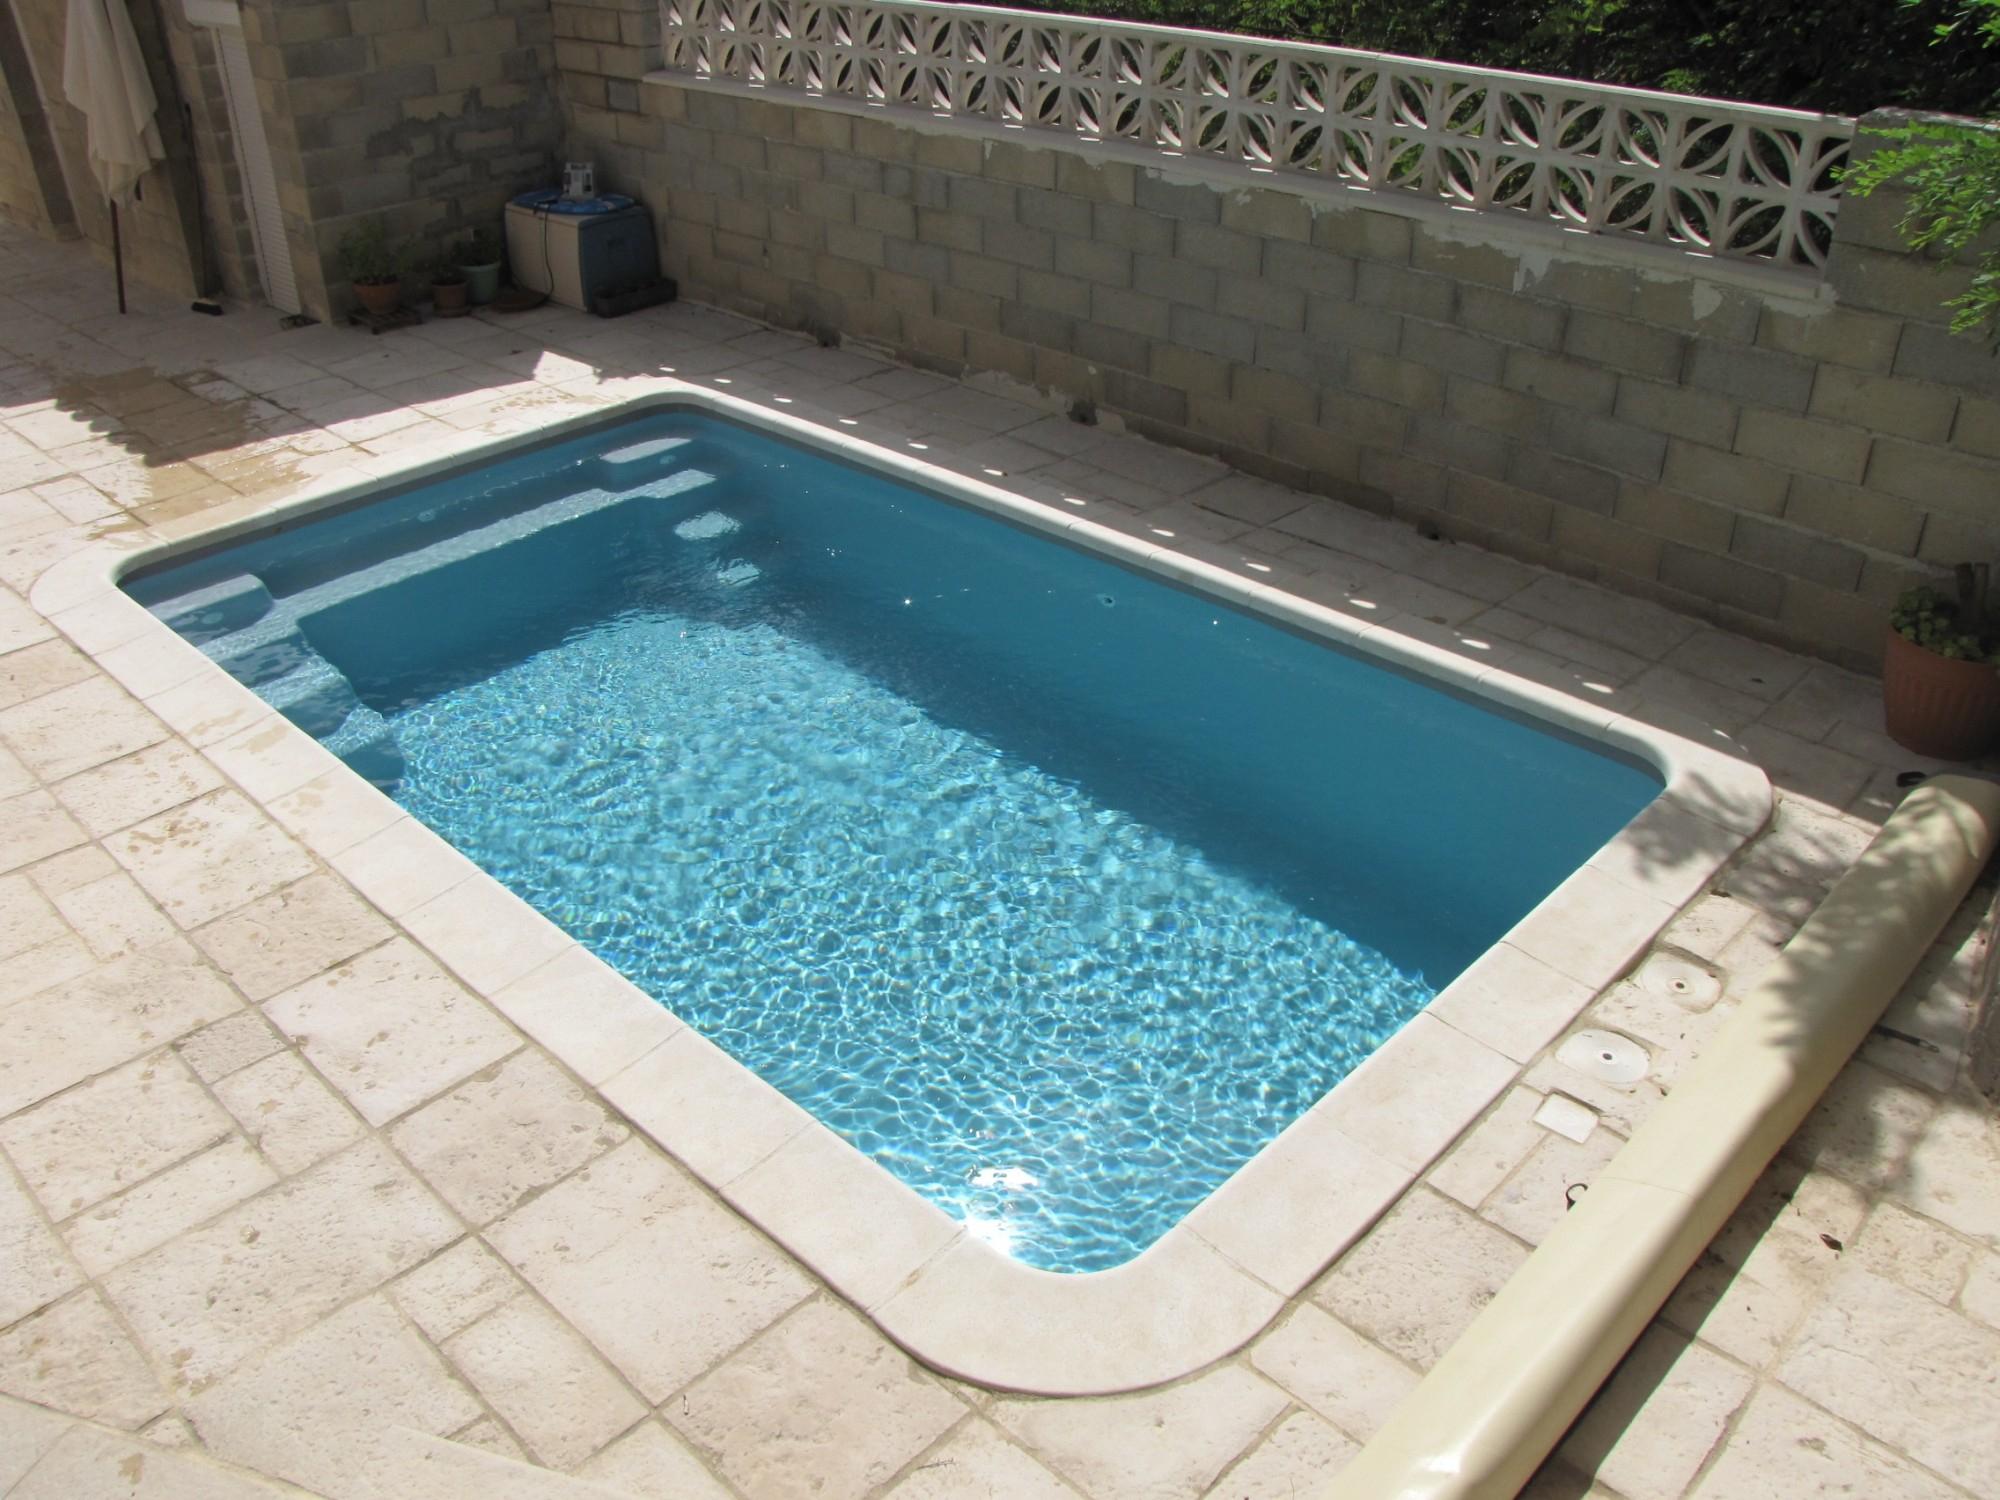 prix piscine coque bahamas Les Piscines du Net